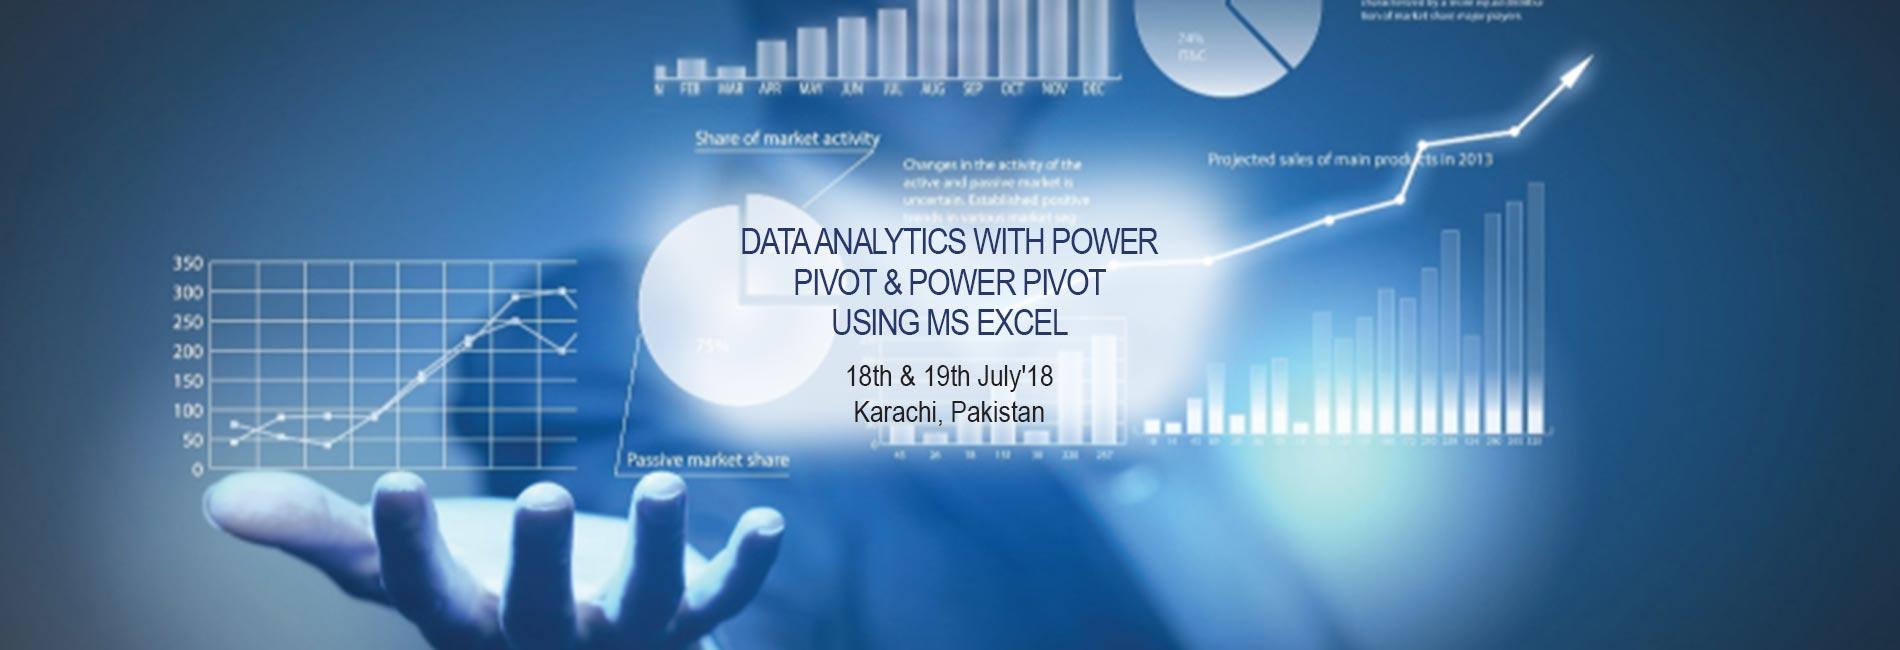 Data Analytics with Power Pivot & Power Pivot using MS Excel